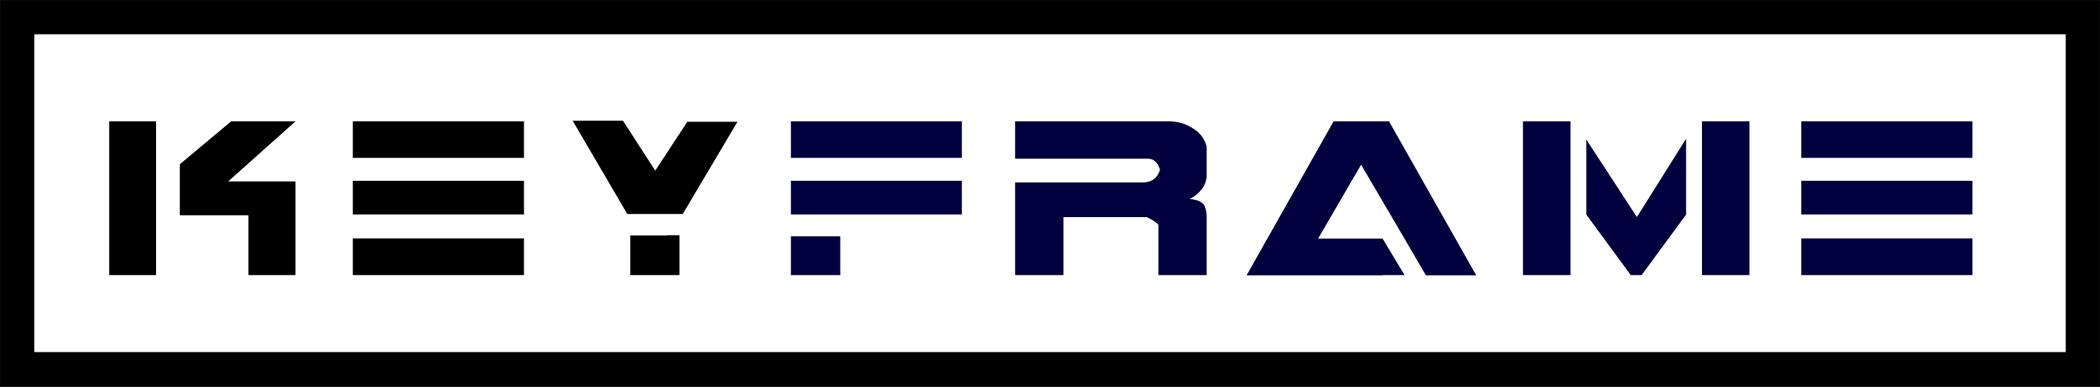 xRS Week 2019 Sponsor - Keyframe-Entertainment